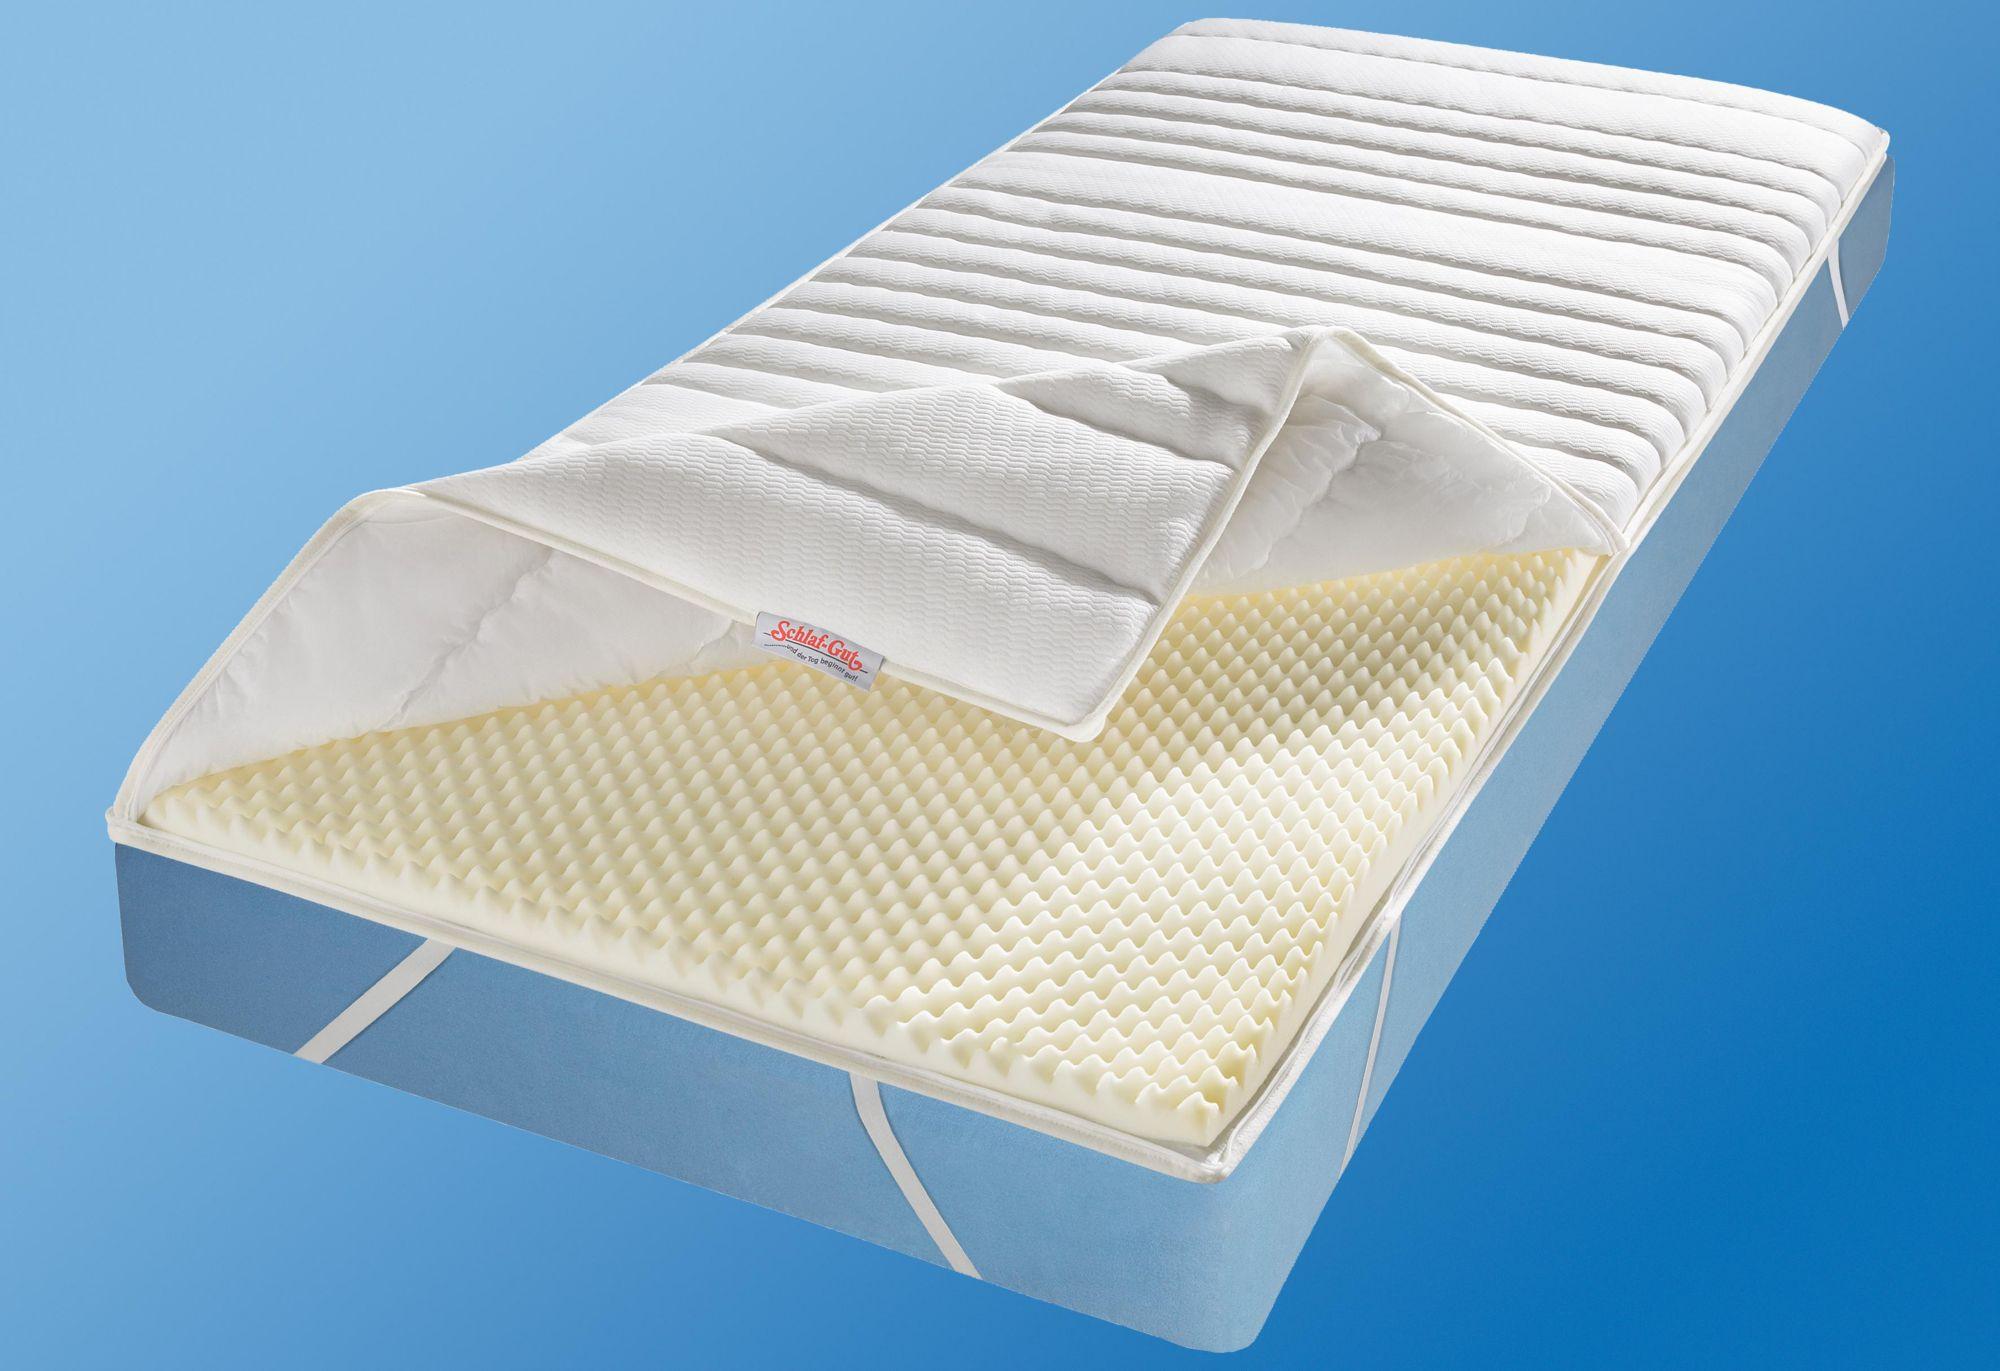 komfortschaum topper schlaf gut komfort ts 1 loch faser. Black Bedroom Furniture Sets. Home Design Ideas